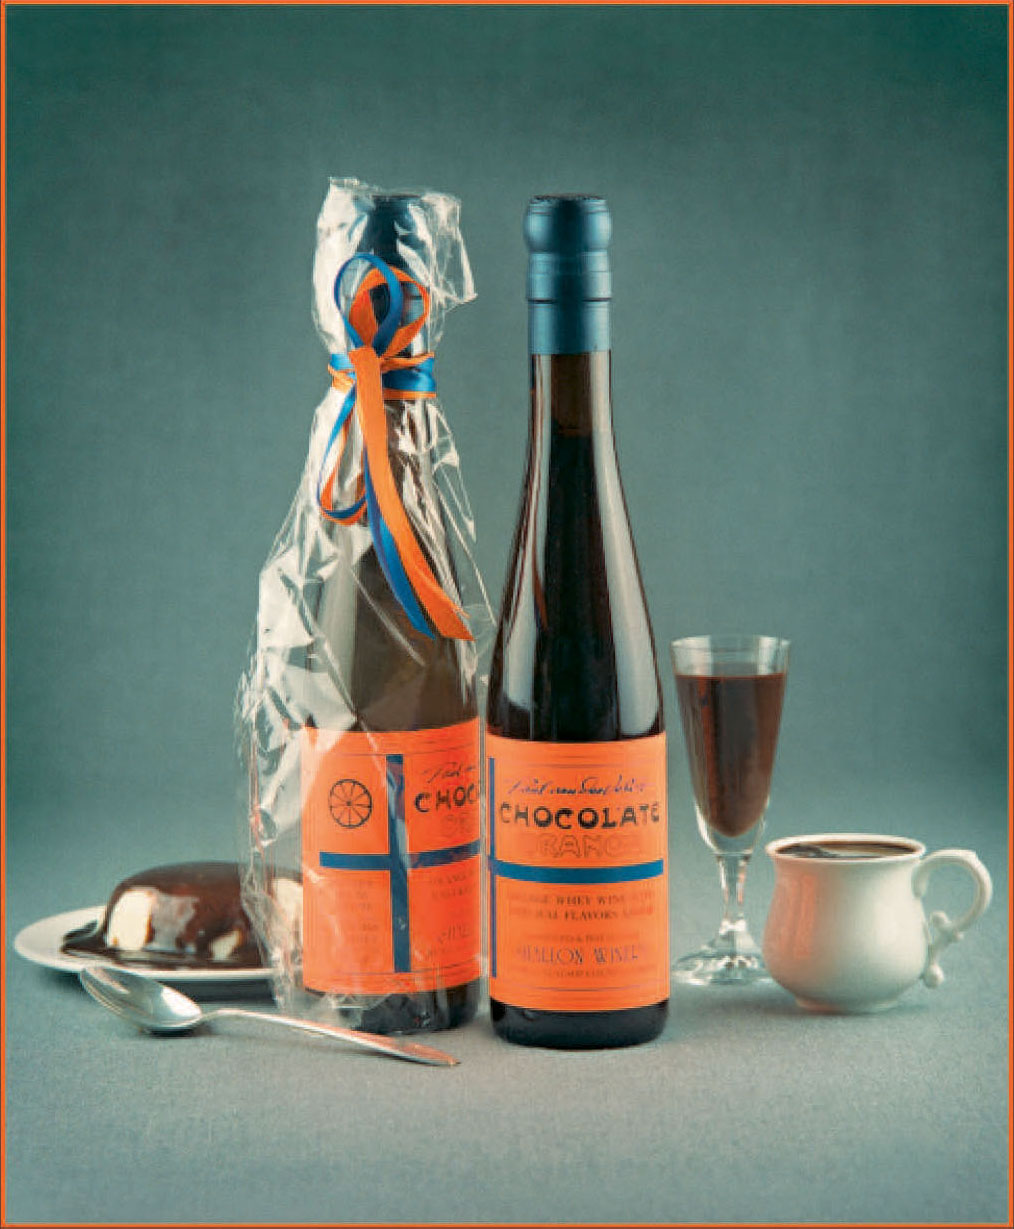 Chocolate Wine?